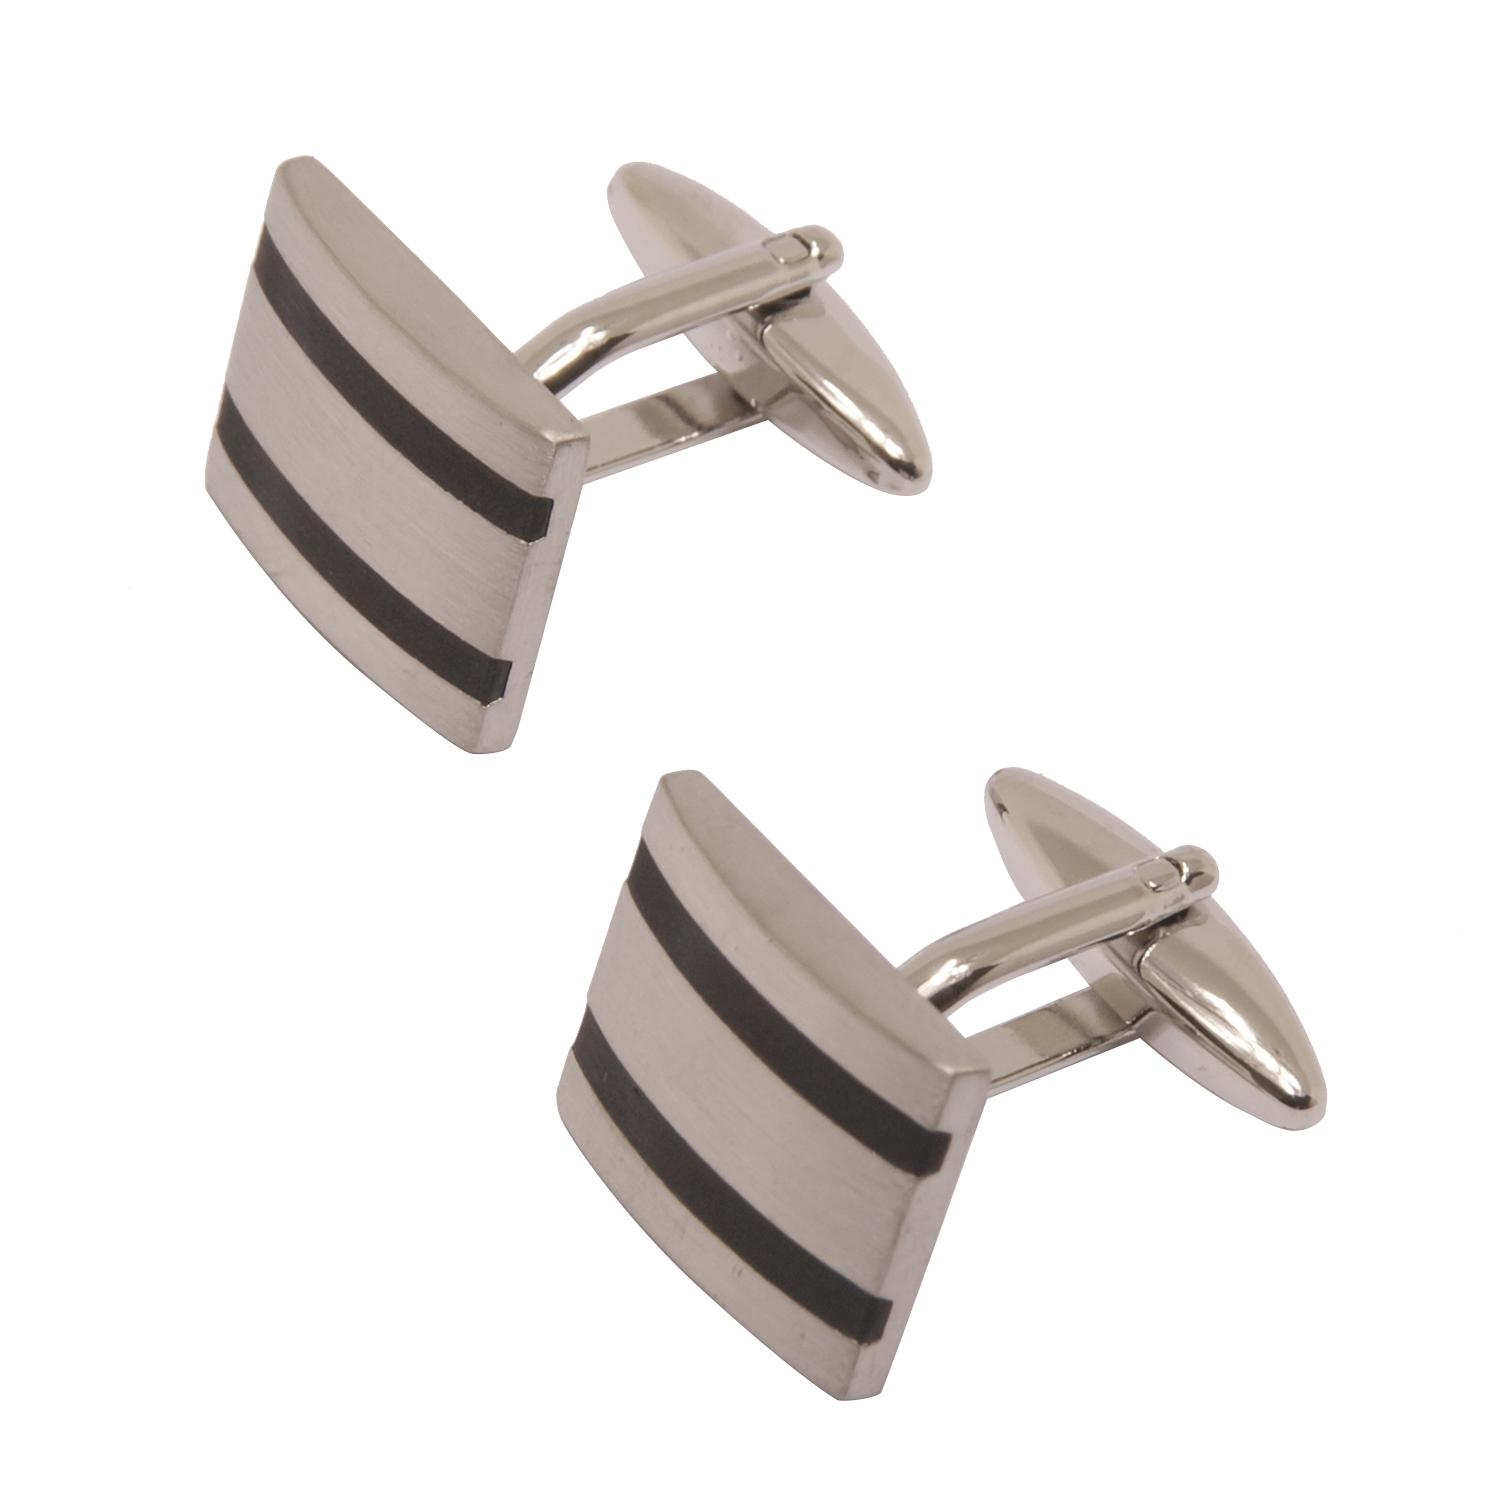 Sophos – Brushed Silver Cufflinks with Black Enamel Stripes in Gift Box